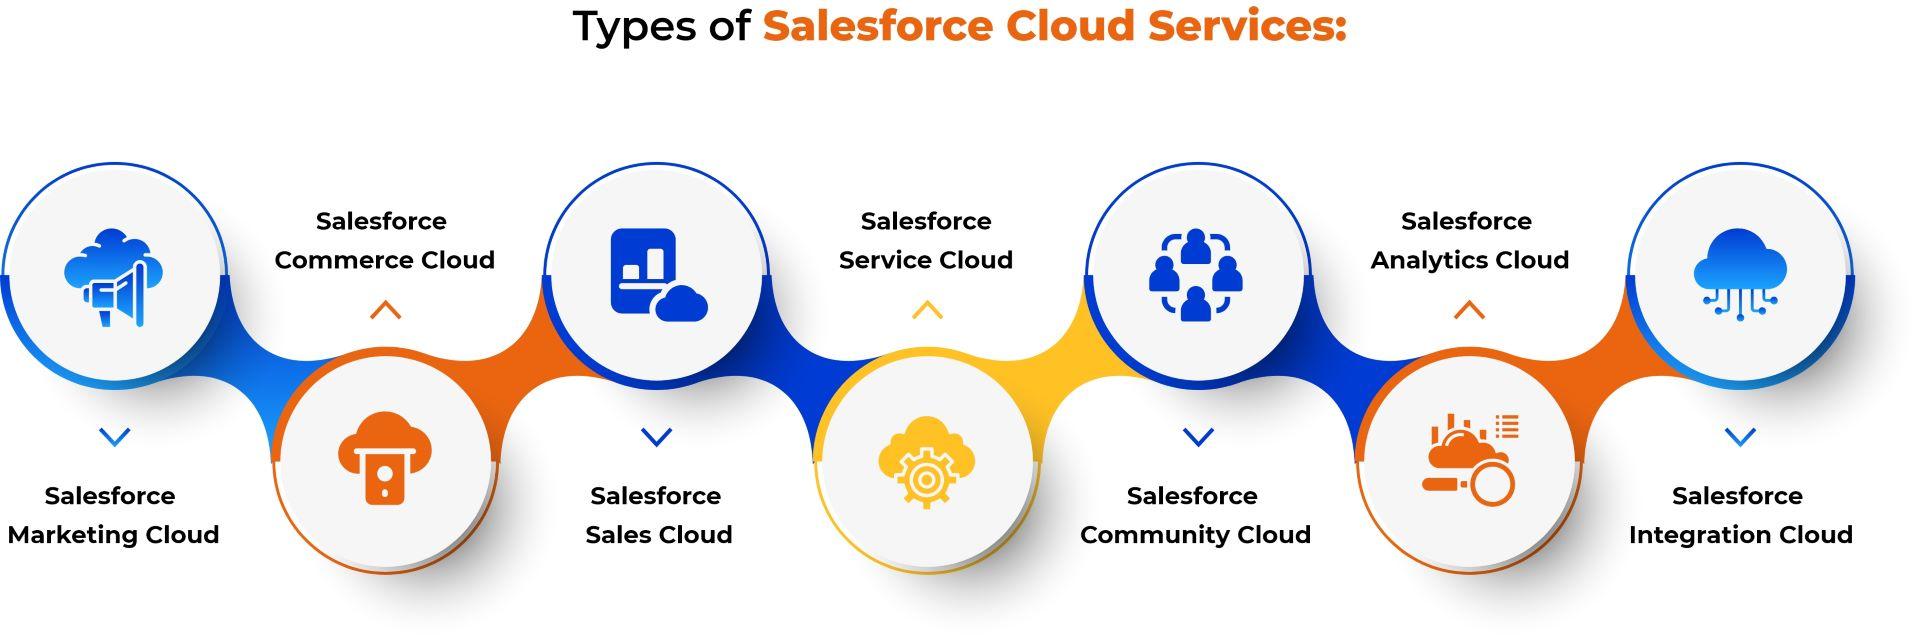 Salesforce Cloud Services Types